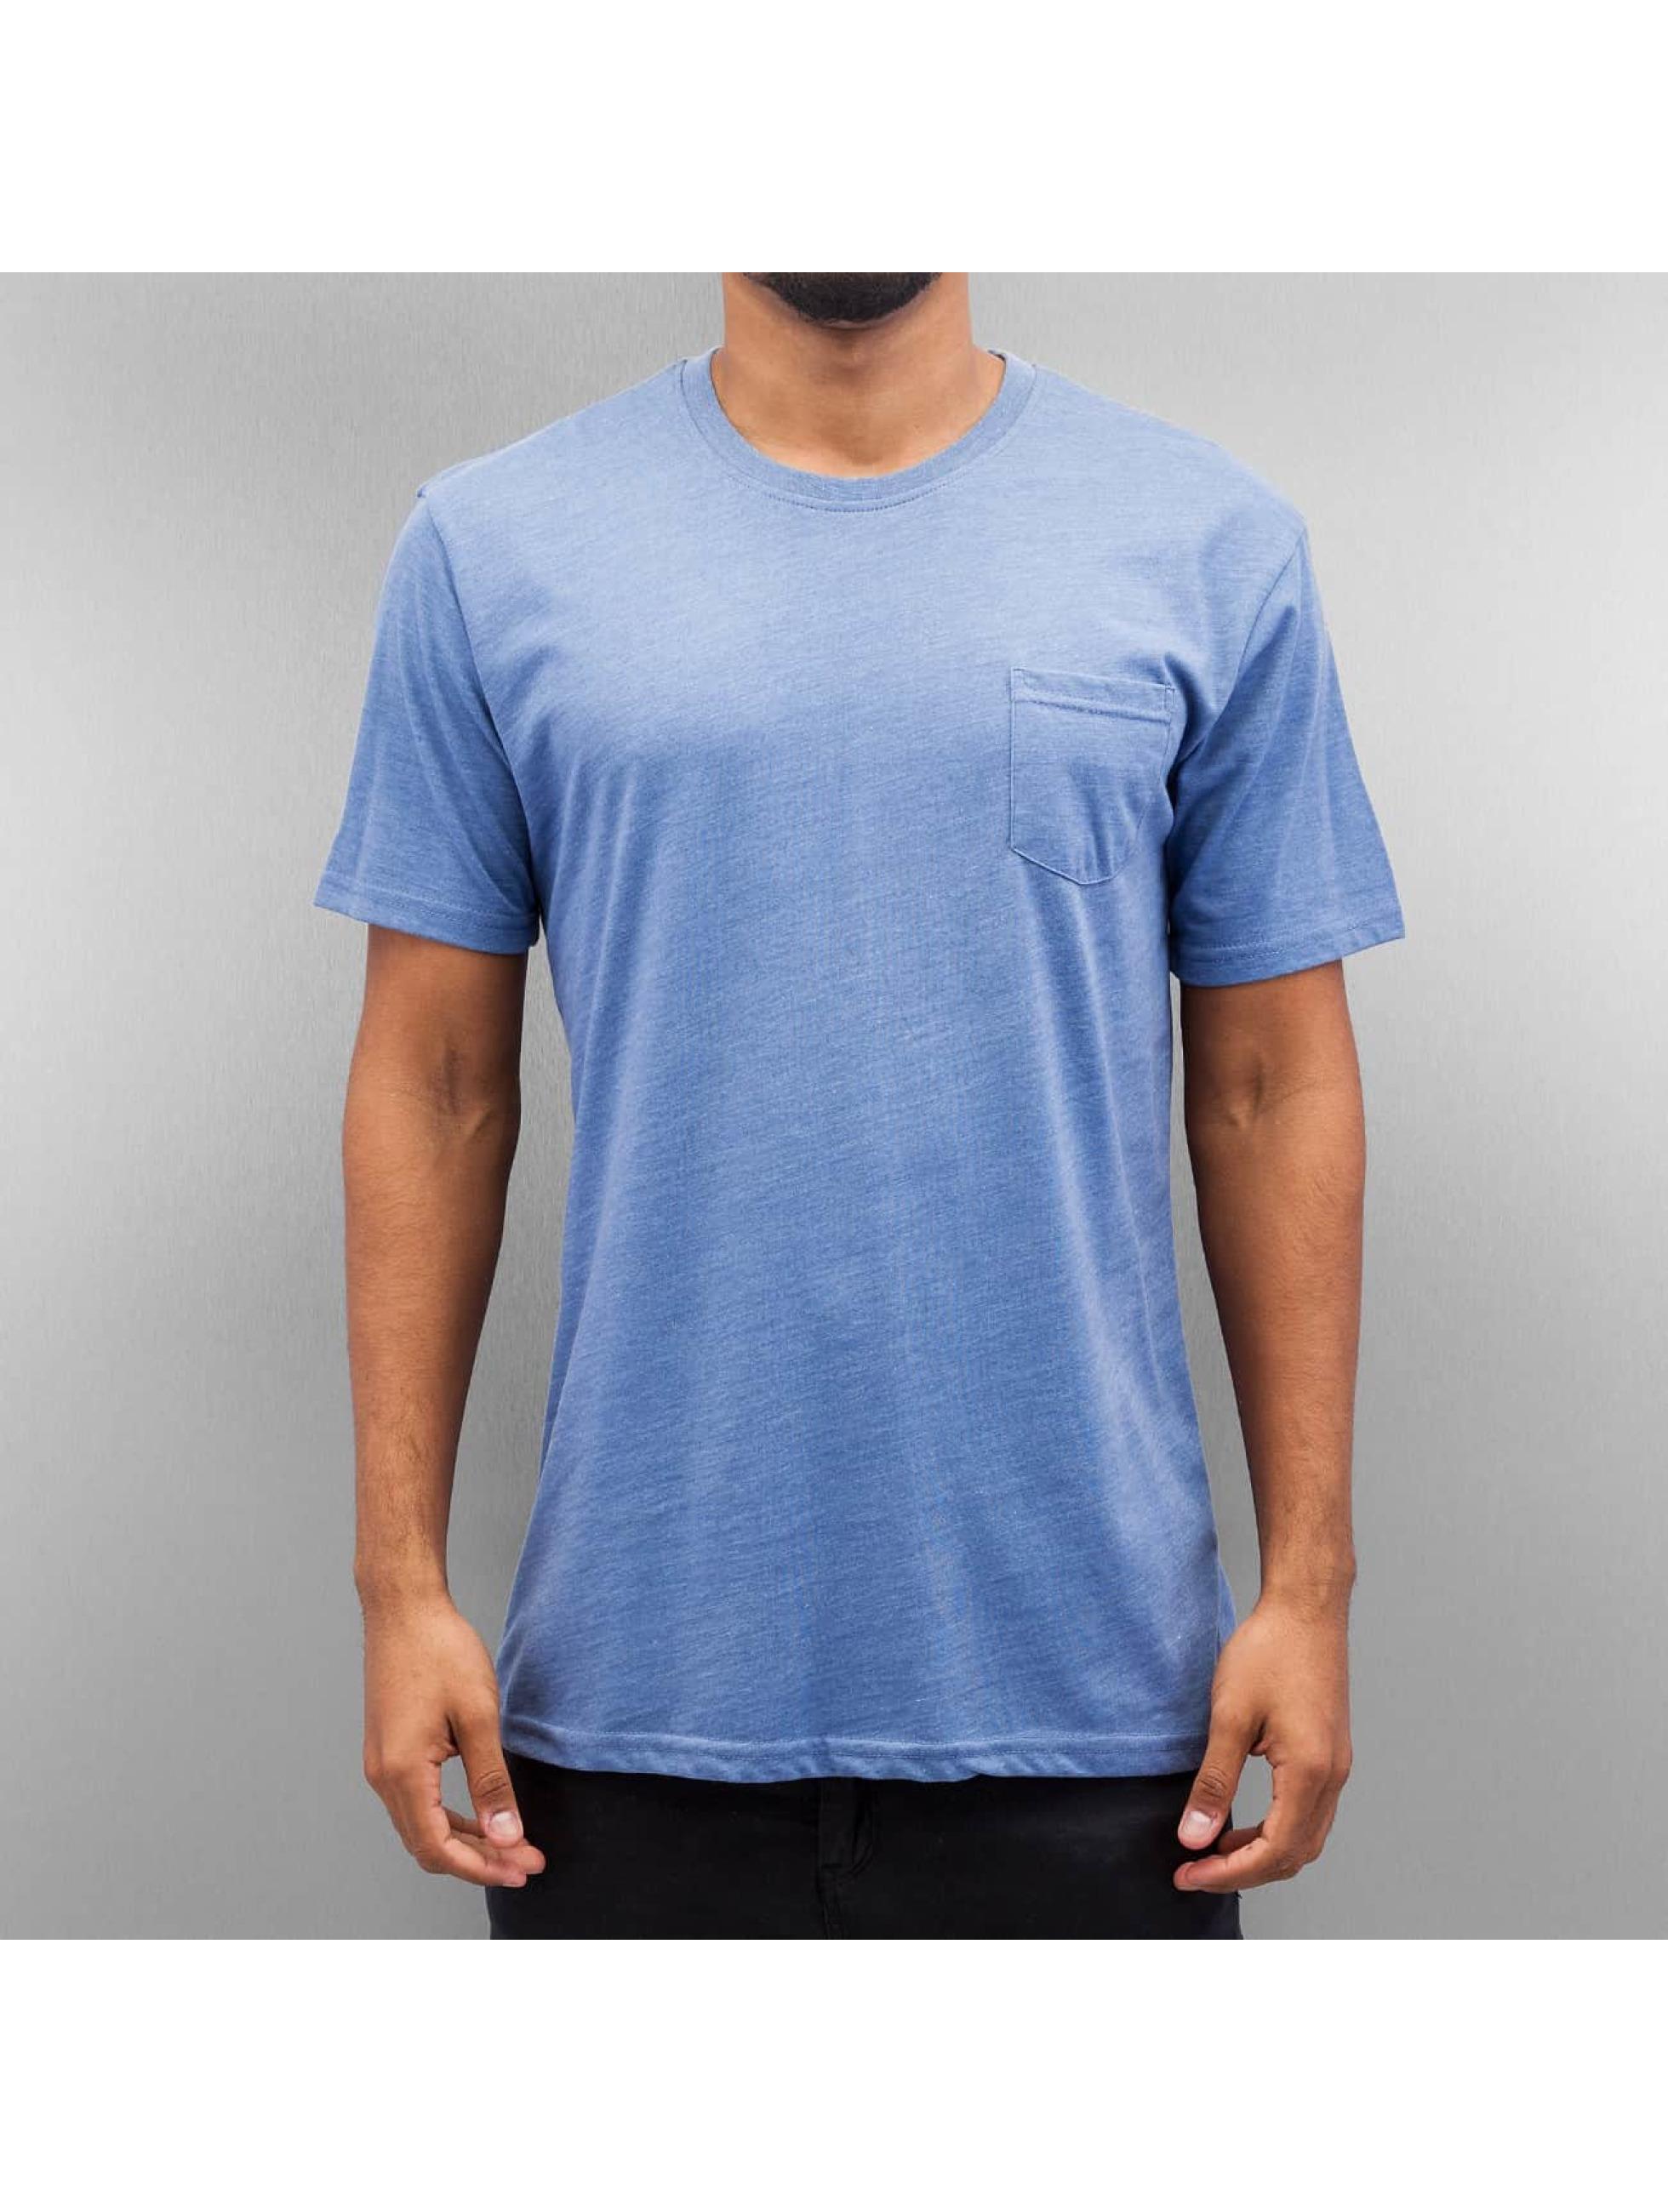 Cyprime Breast Pocket T Shirt Grey Blue